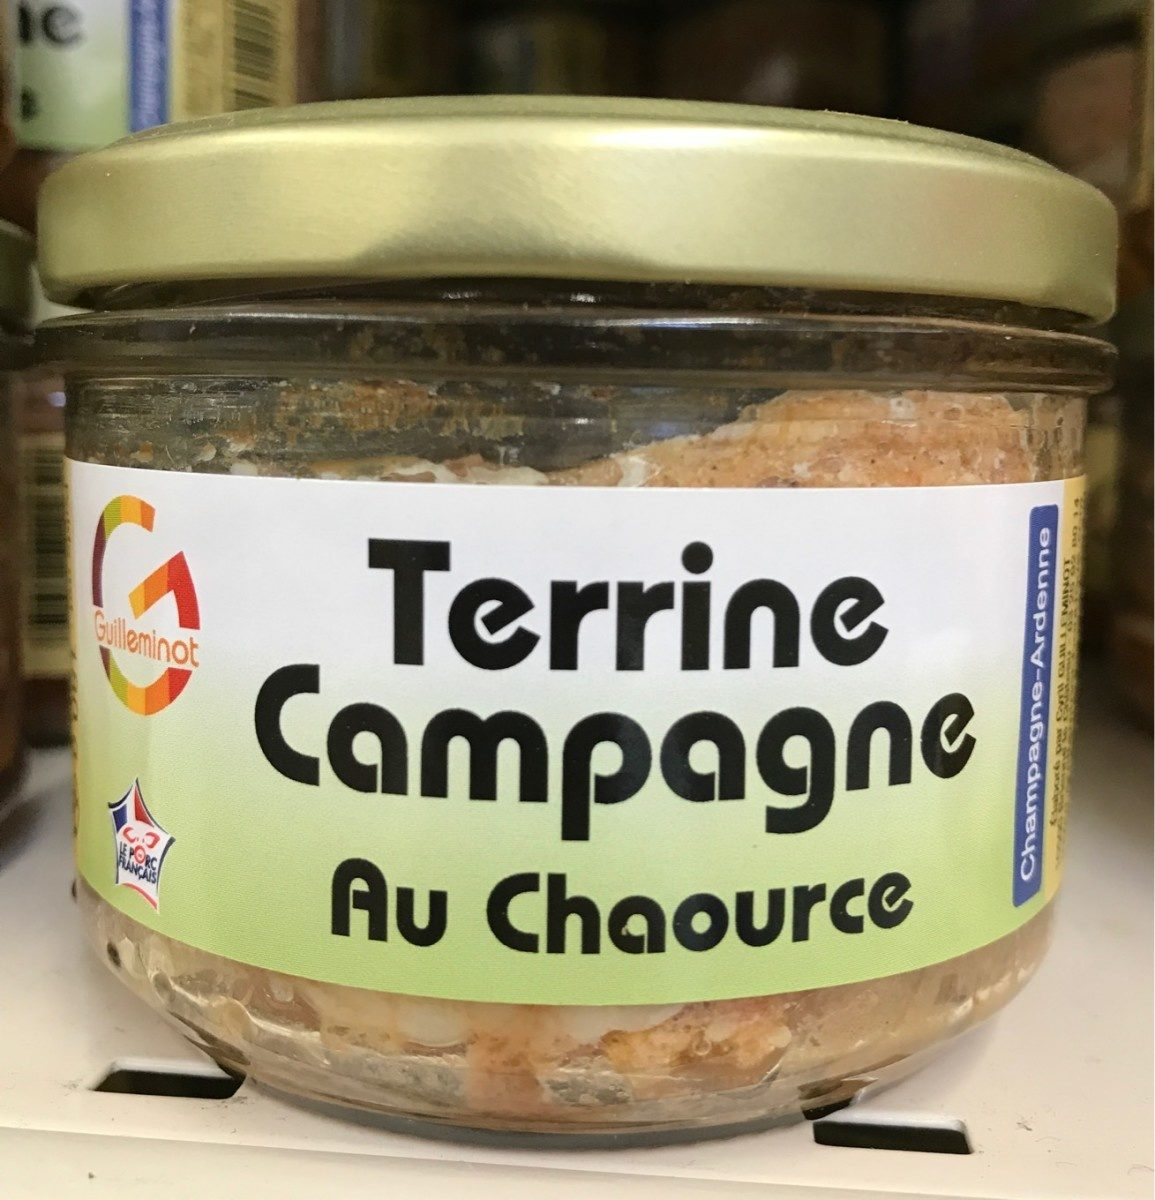 Terrine campagne au chaource - Produit - fr